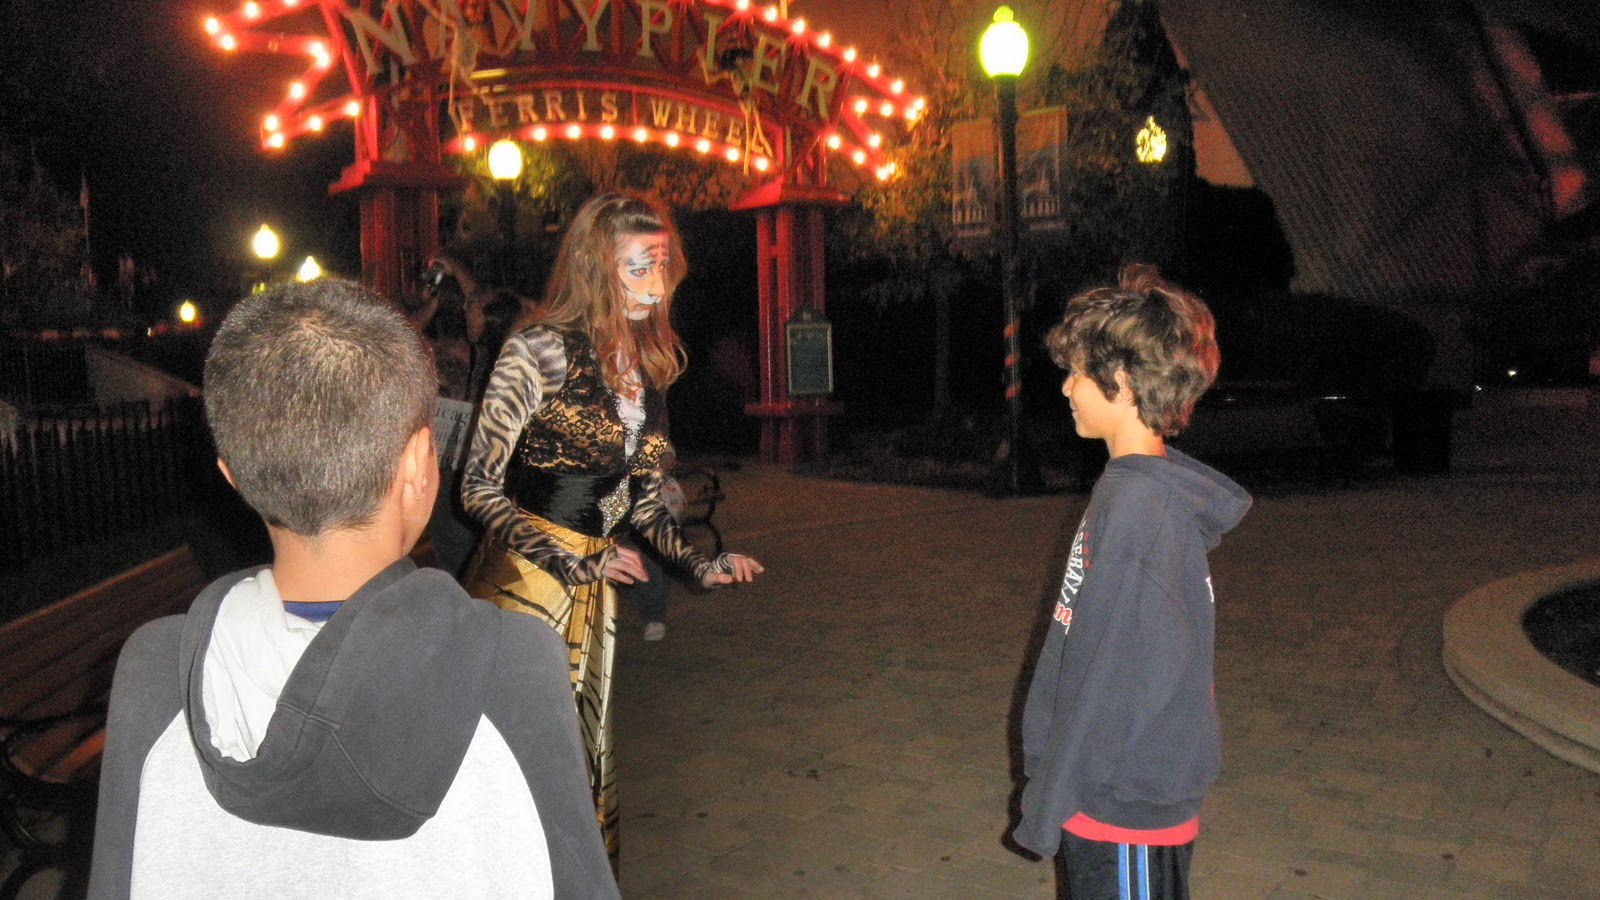 kidwinks.com Blog - Chicago with Kids: Kidwinks visits Halloween ...